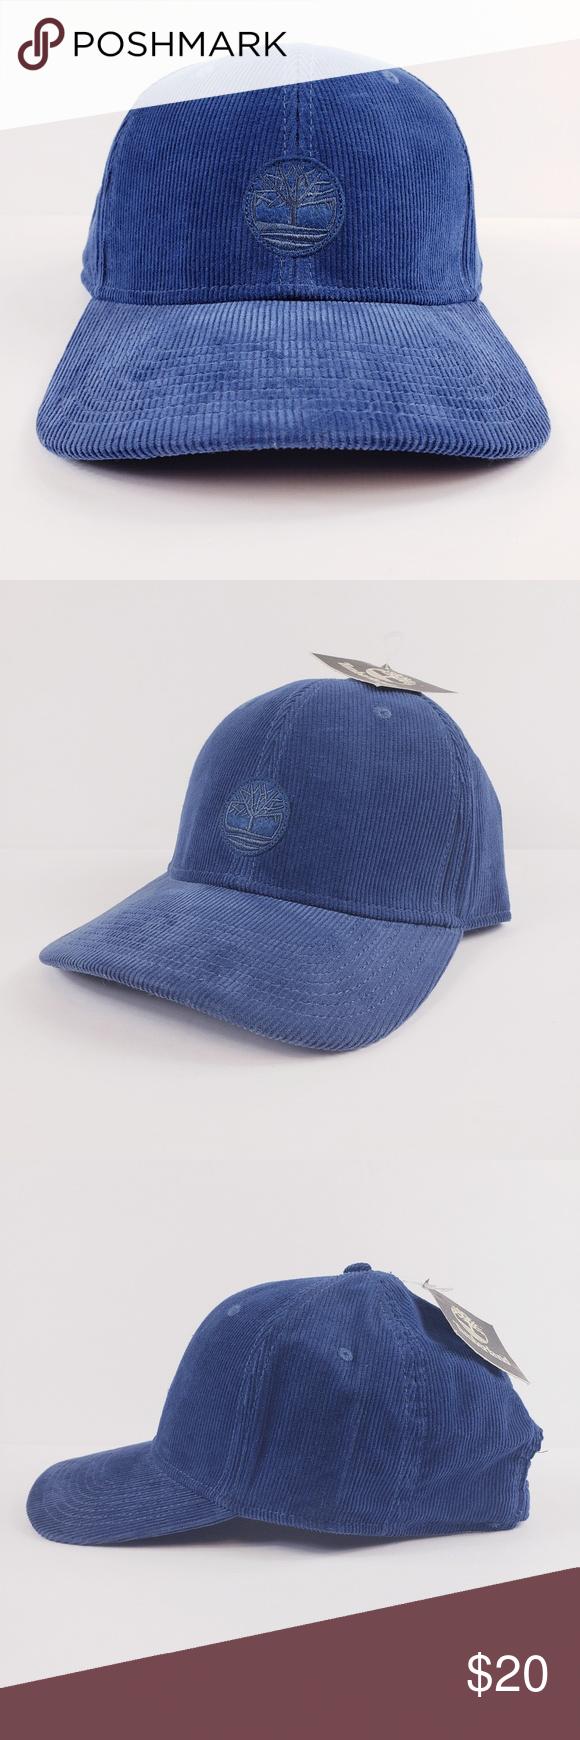 b2b0b5b52de NWT Timberland Blue Corduroy Strapback Hat OSFM Brand new with tags Men s Timberland  Hat Blue Corduroy